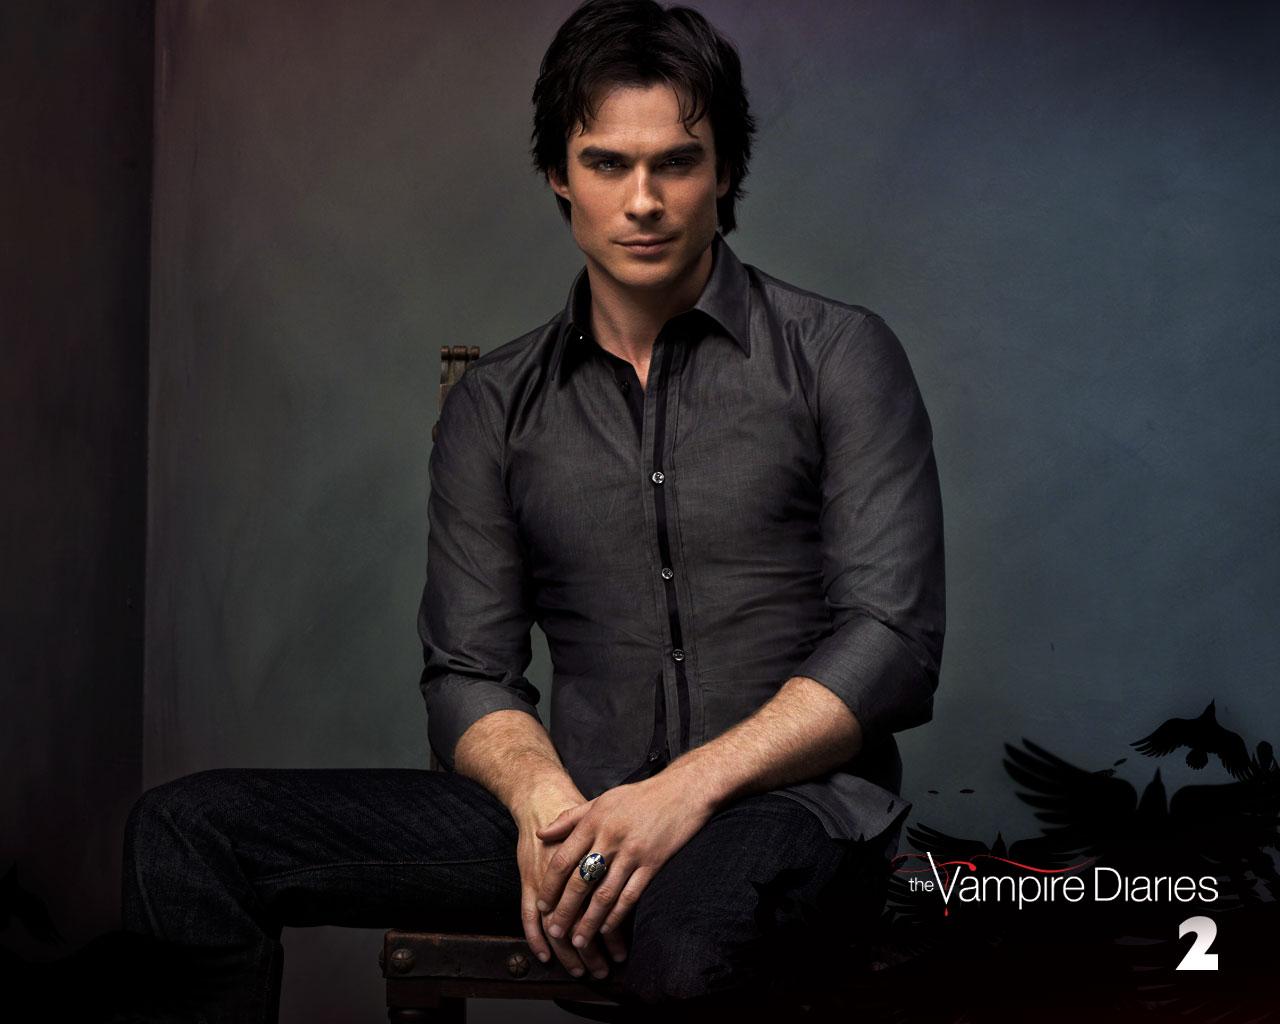 Damon Vampire Diaries Wallpaper 1280x1024 s2 damonjpg 1280x1024